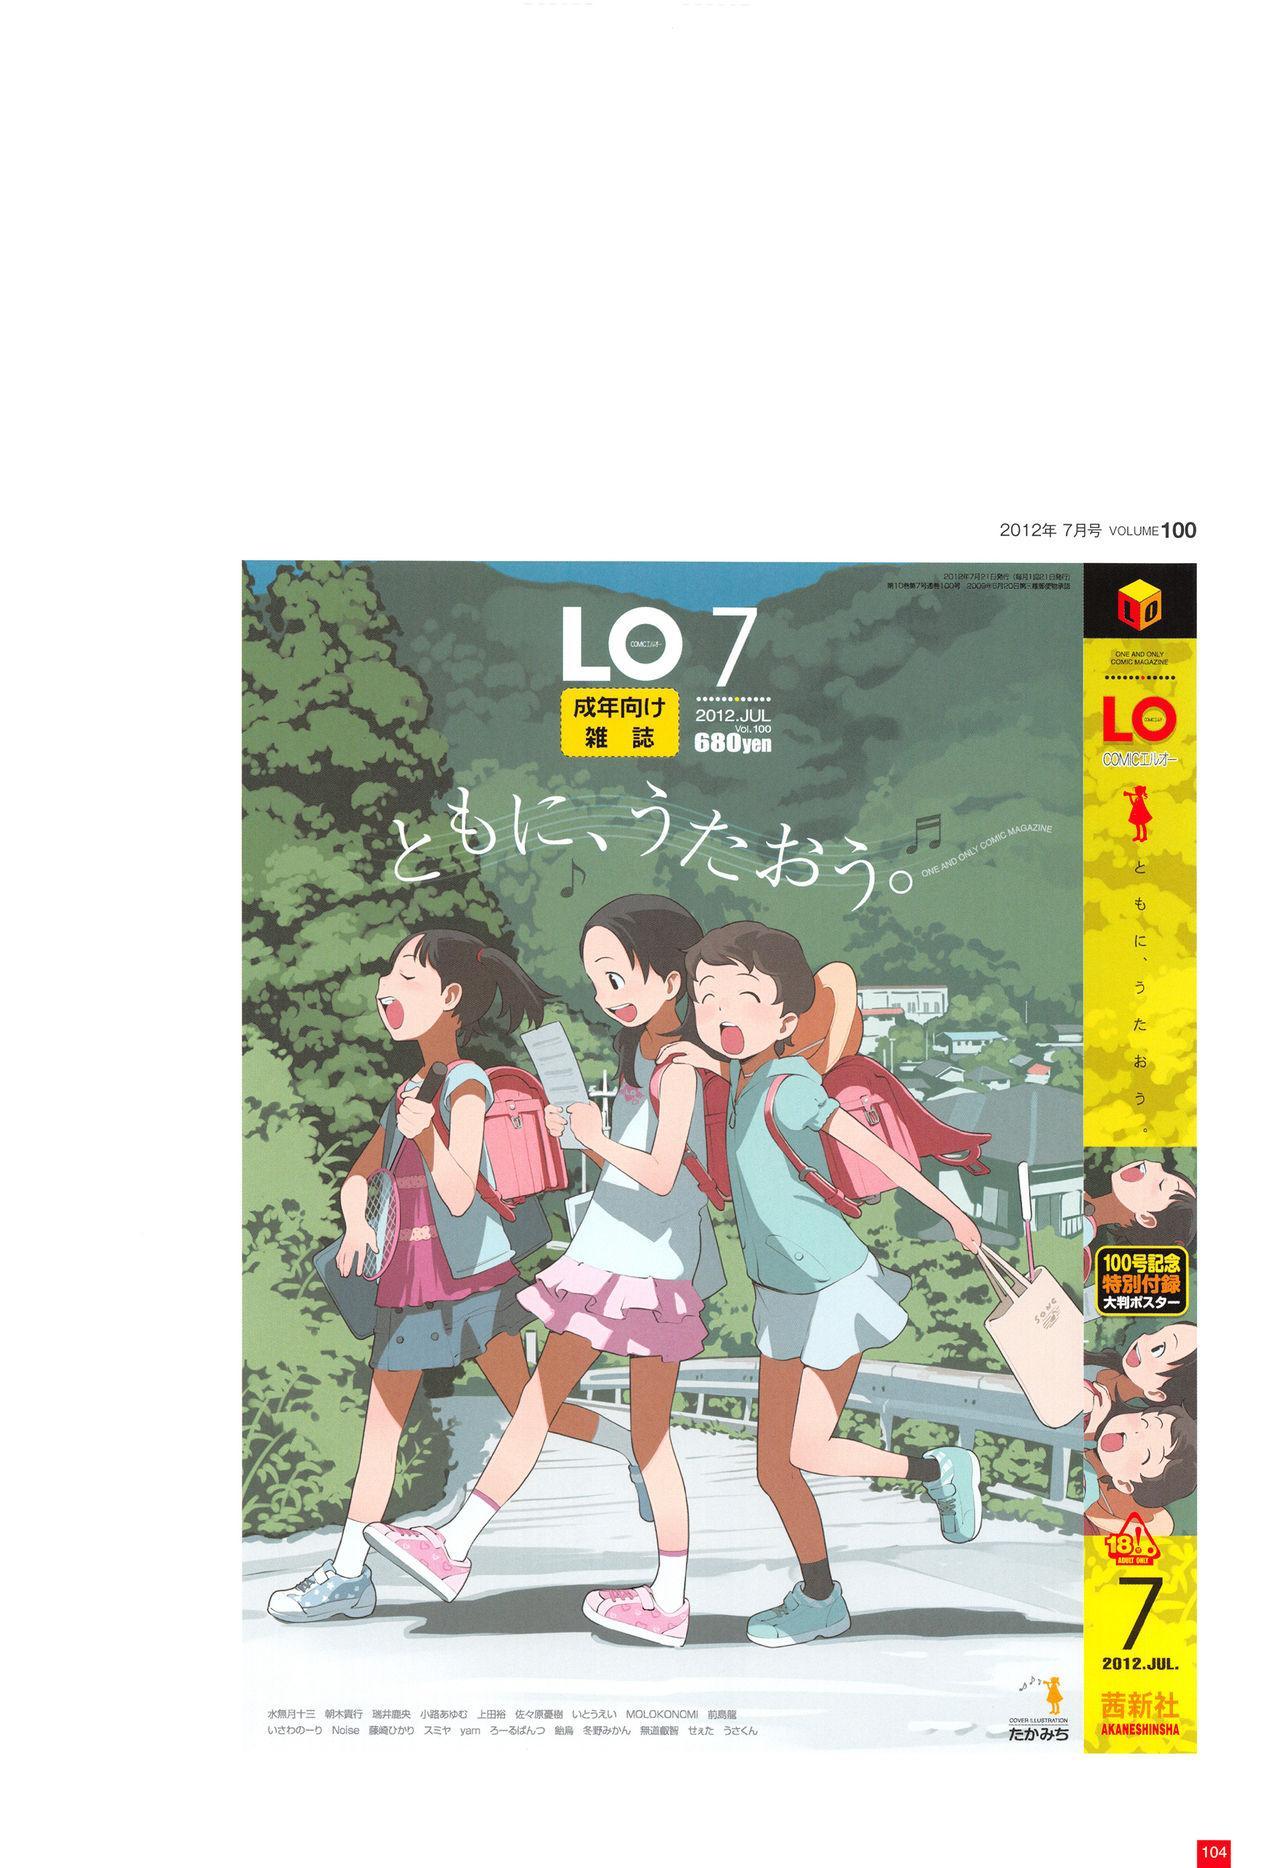 LO Artbook 2-A TAKAMICHI LOOP WORKS 106